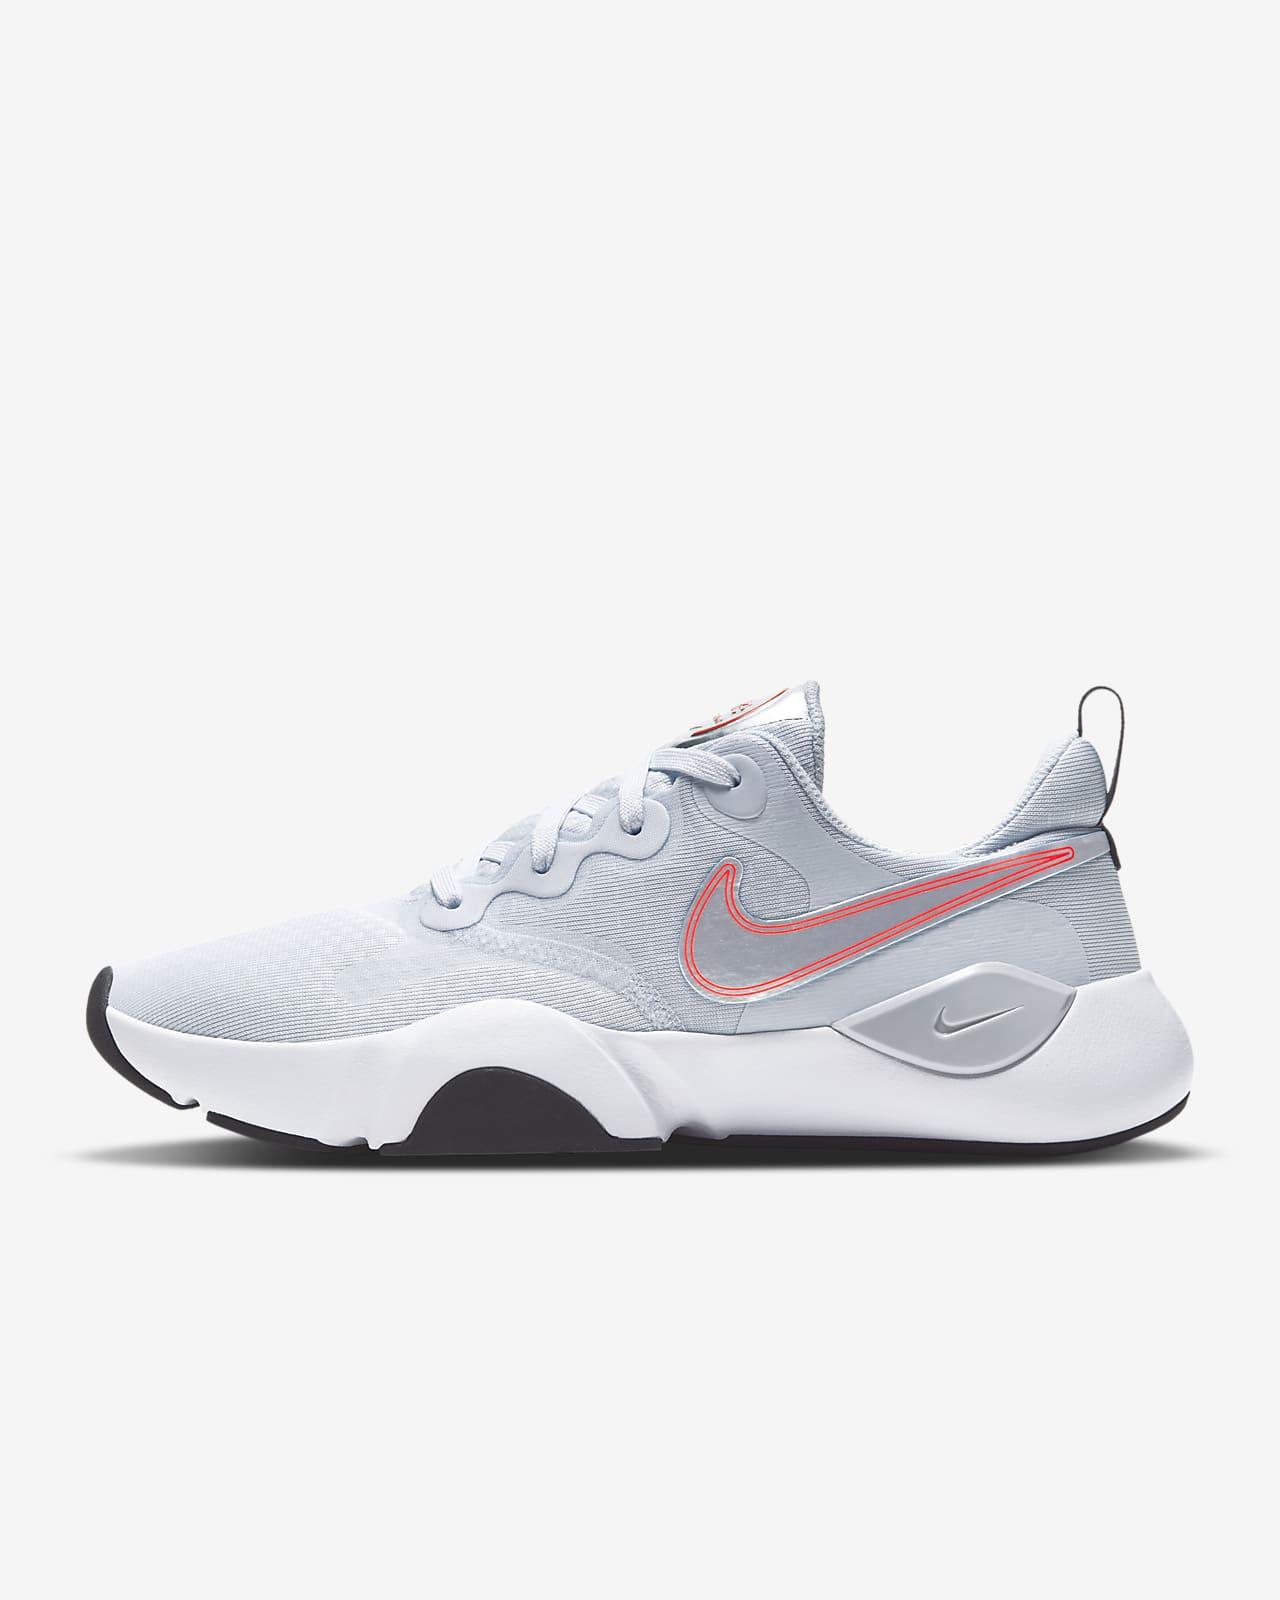 Chaussure de training Nike SpeedRep pour Femme